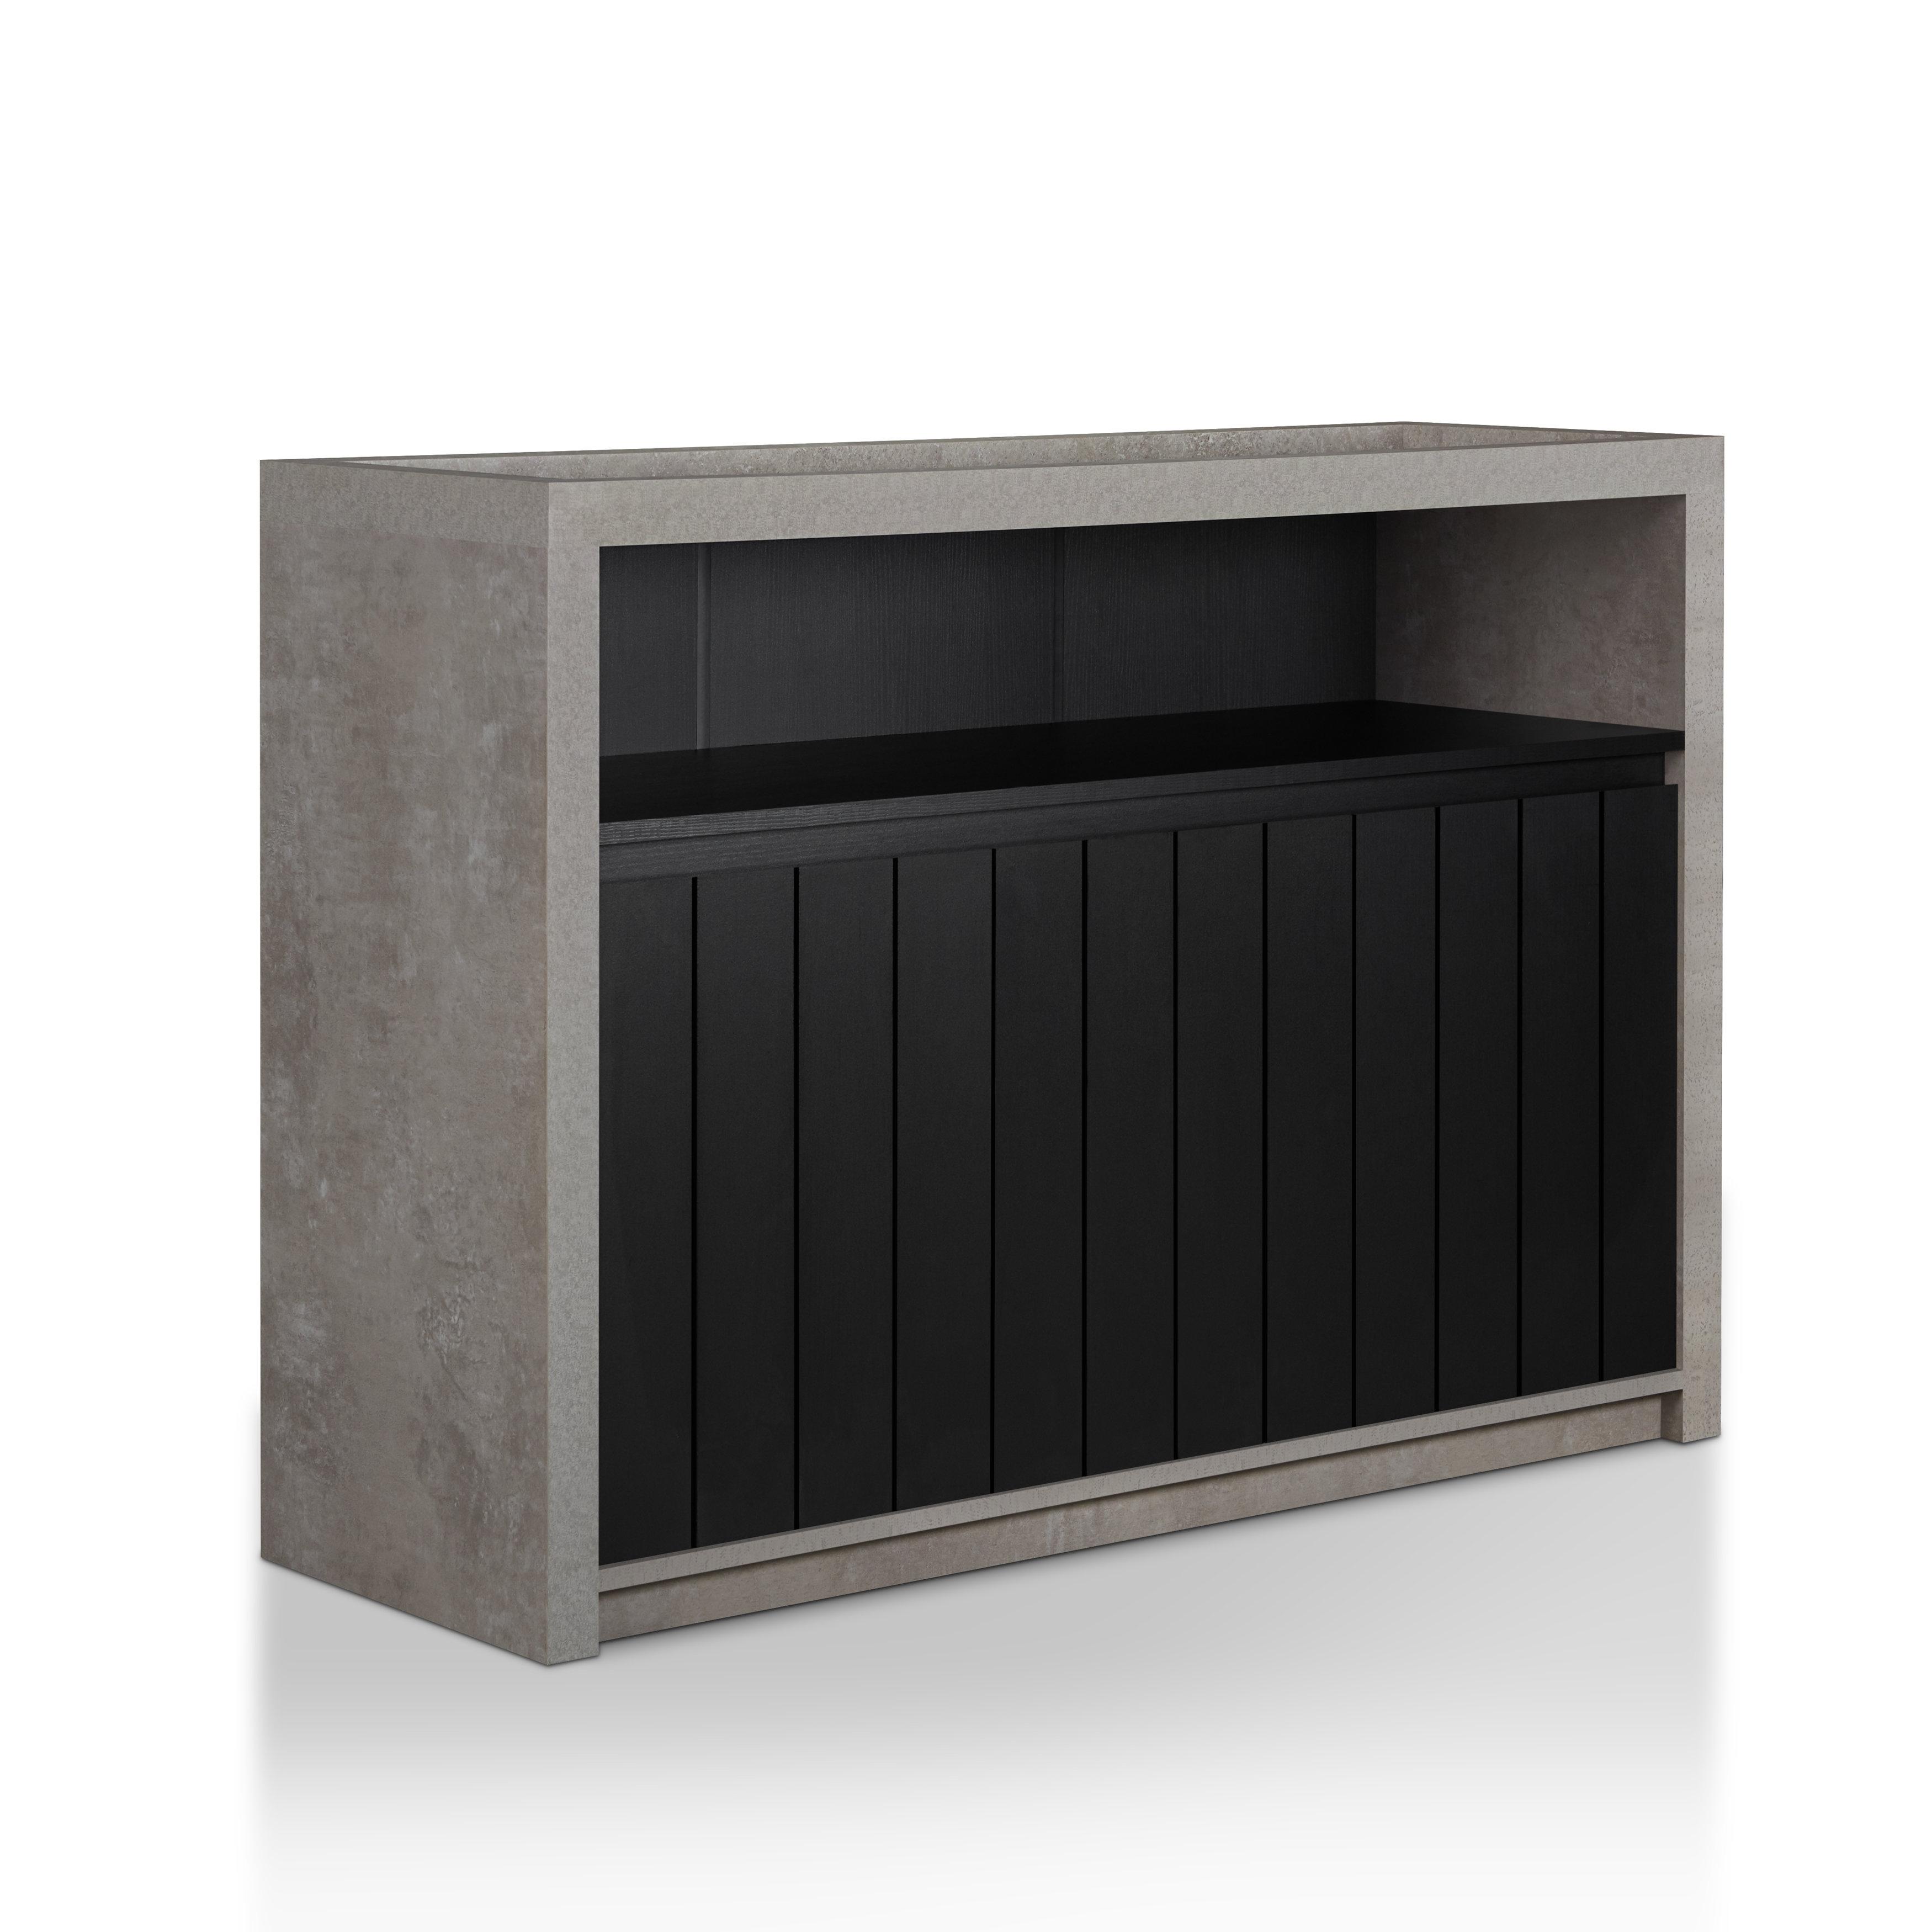 Stribling Transitional Shoe Storage Cabinet Intended For Current Jacklyn 3 Door Sideboards (#19 of 20)